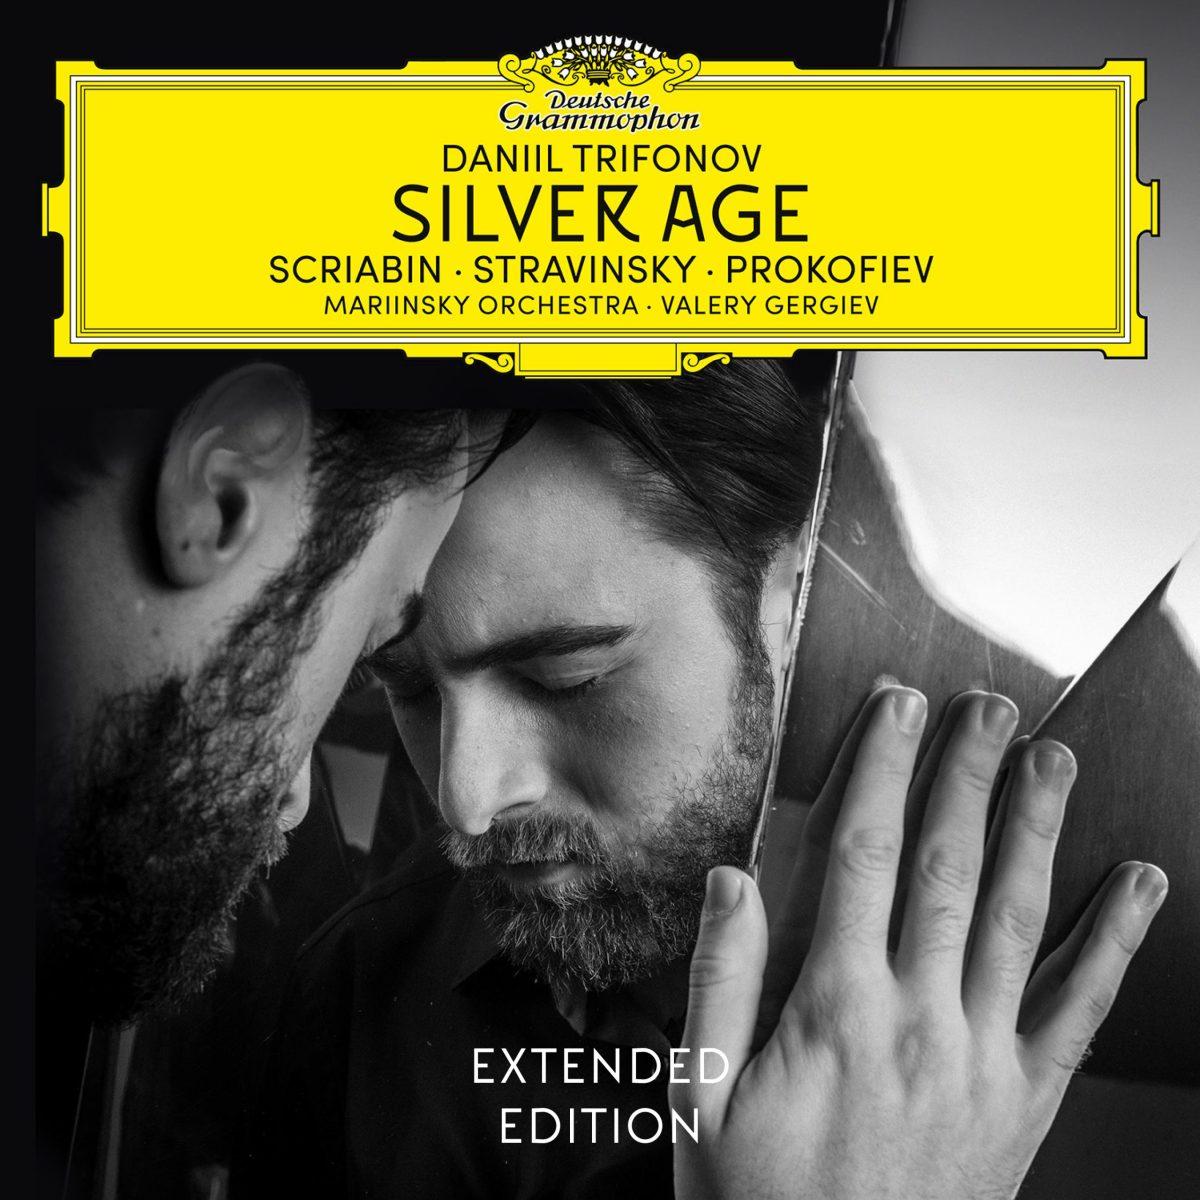 19 - Daniil Trifonov - Silver Age (Extended Edition)